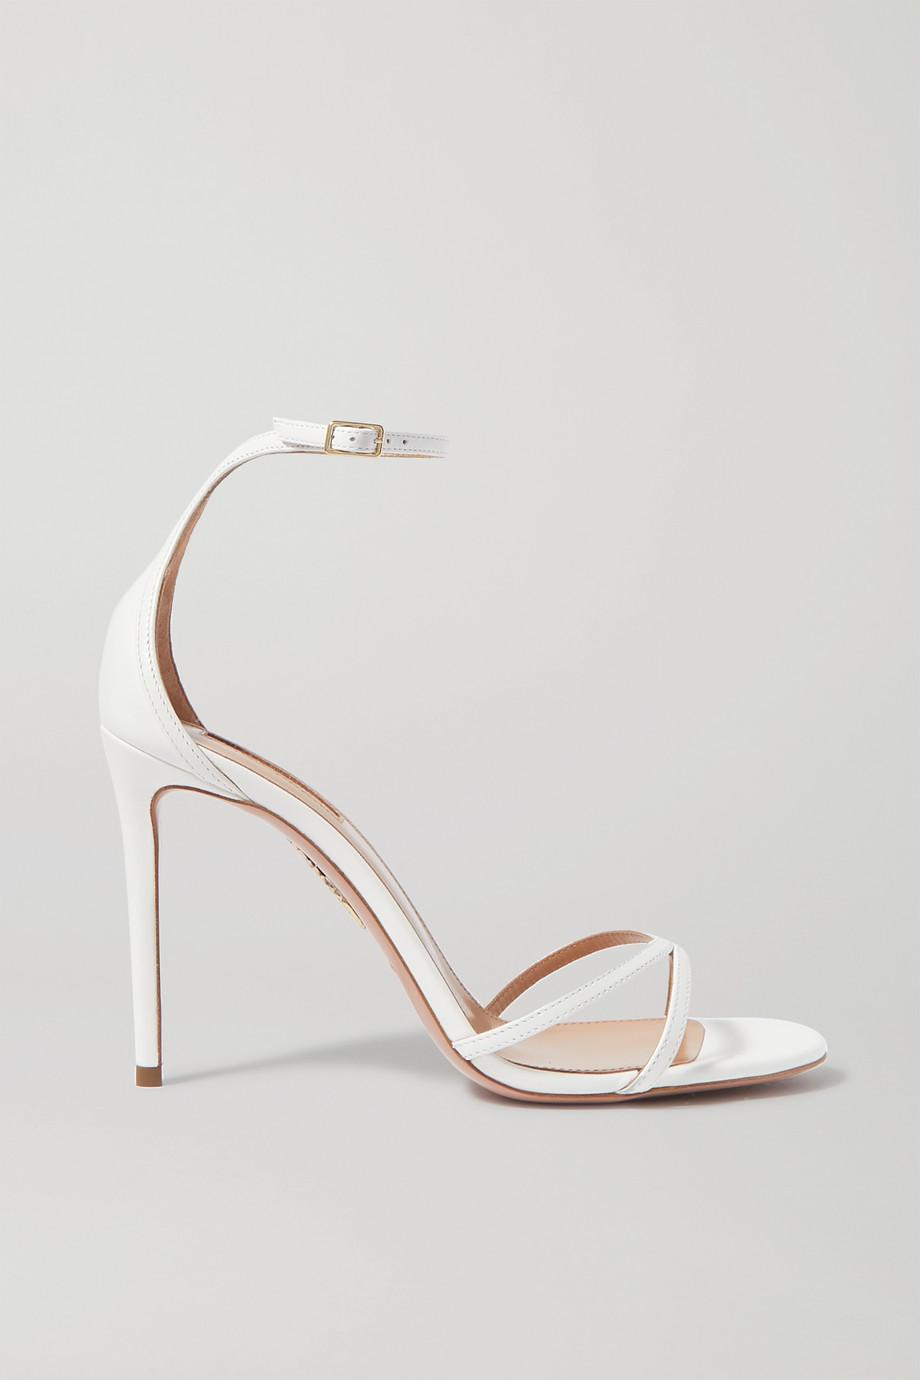 Aquazzura Purist 105 leather sandals